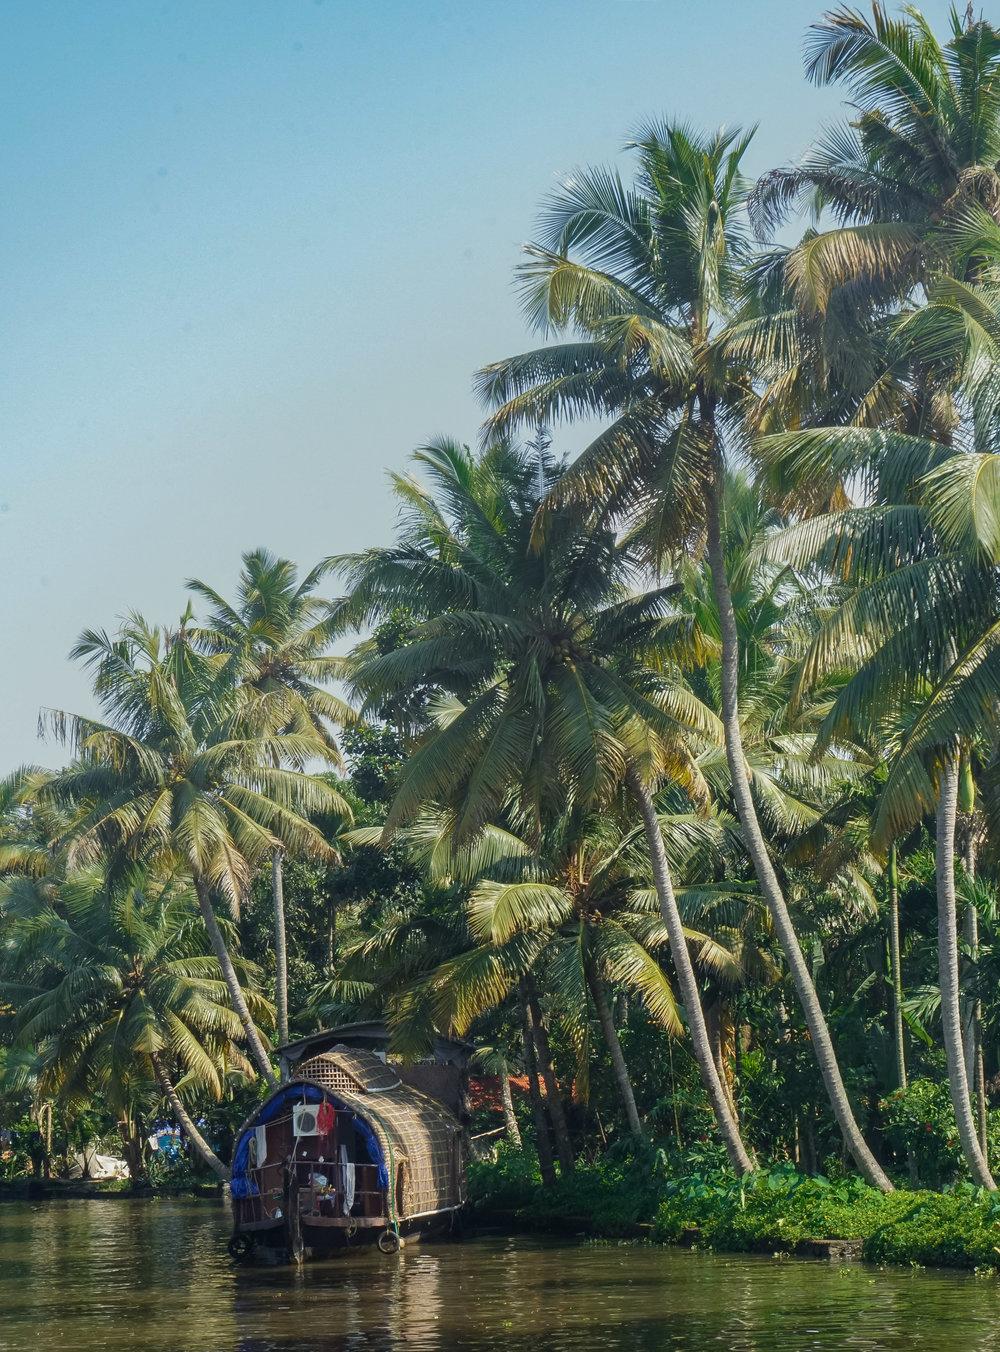 curio.trips.india.kerala.backwaters.houseboat.jpg